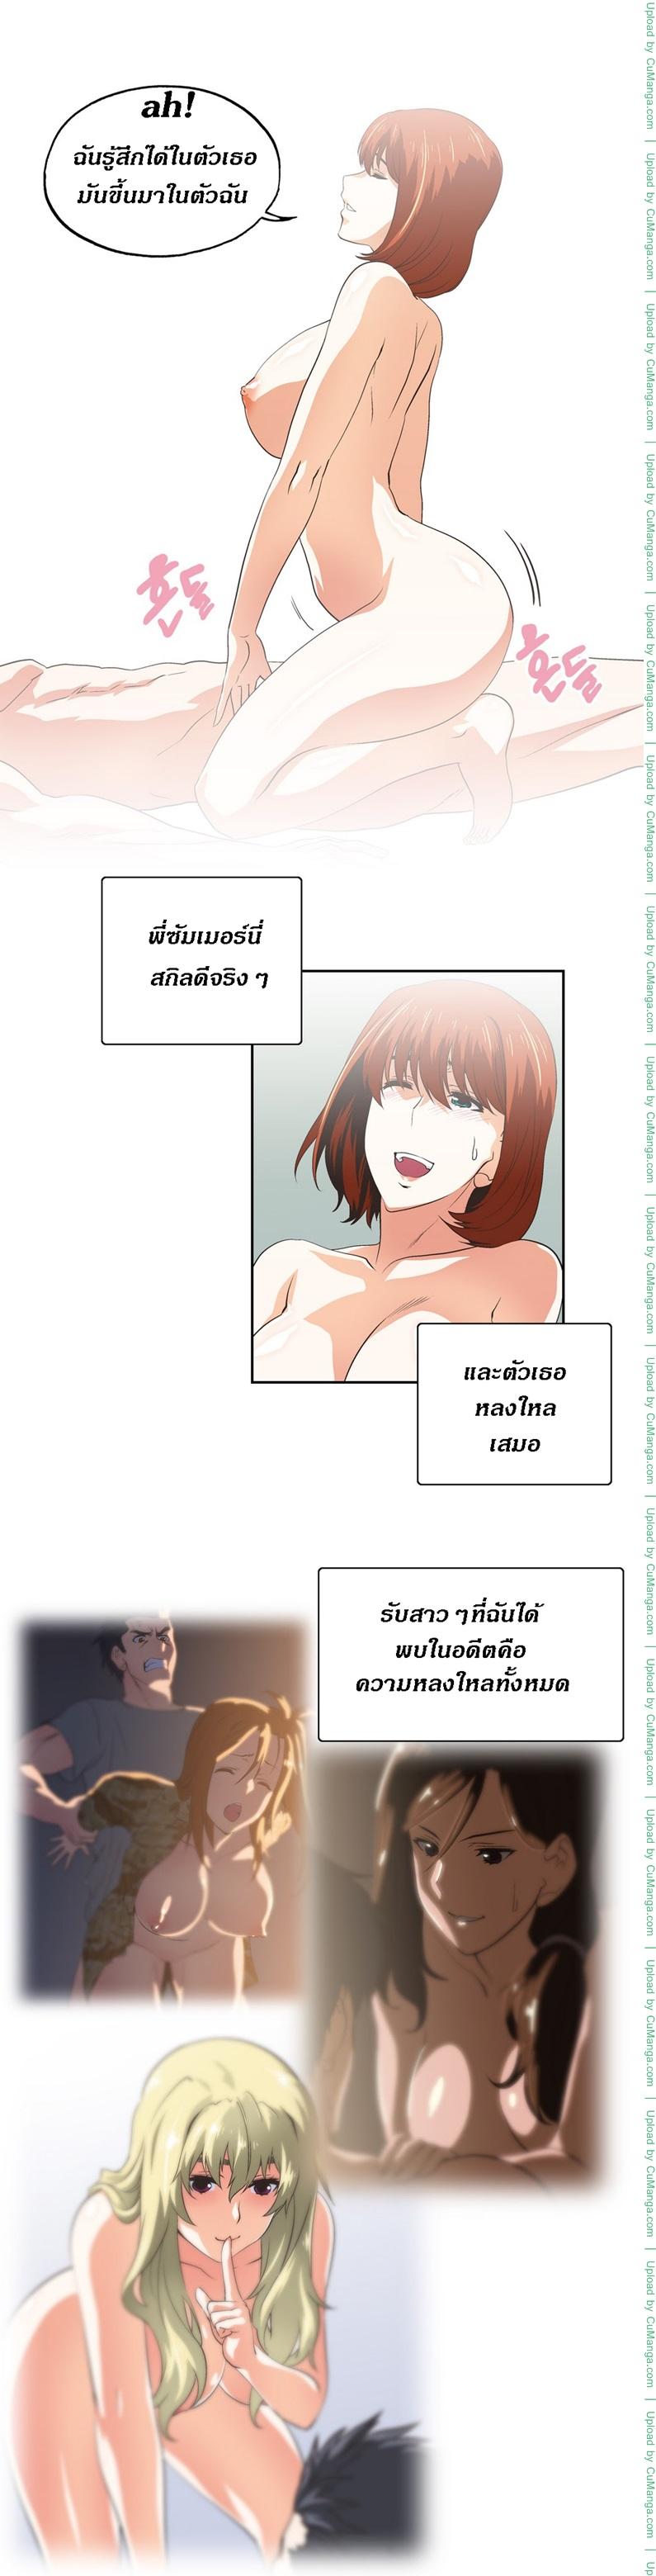 SStudy 44 - หน้า 24